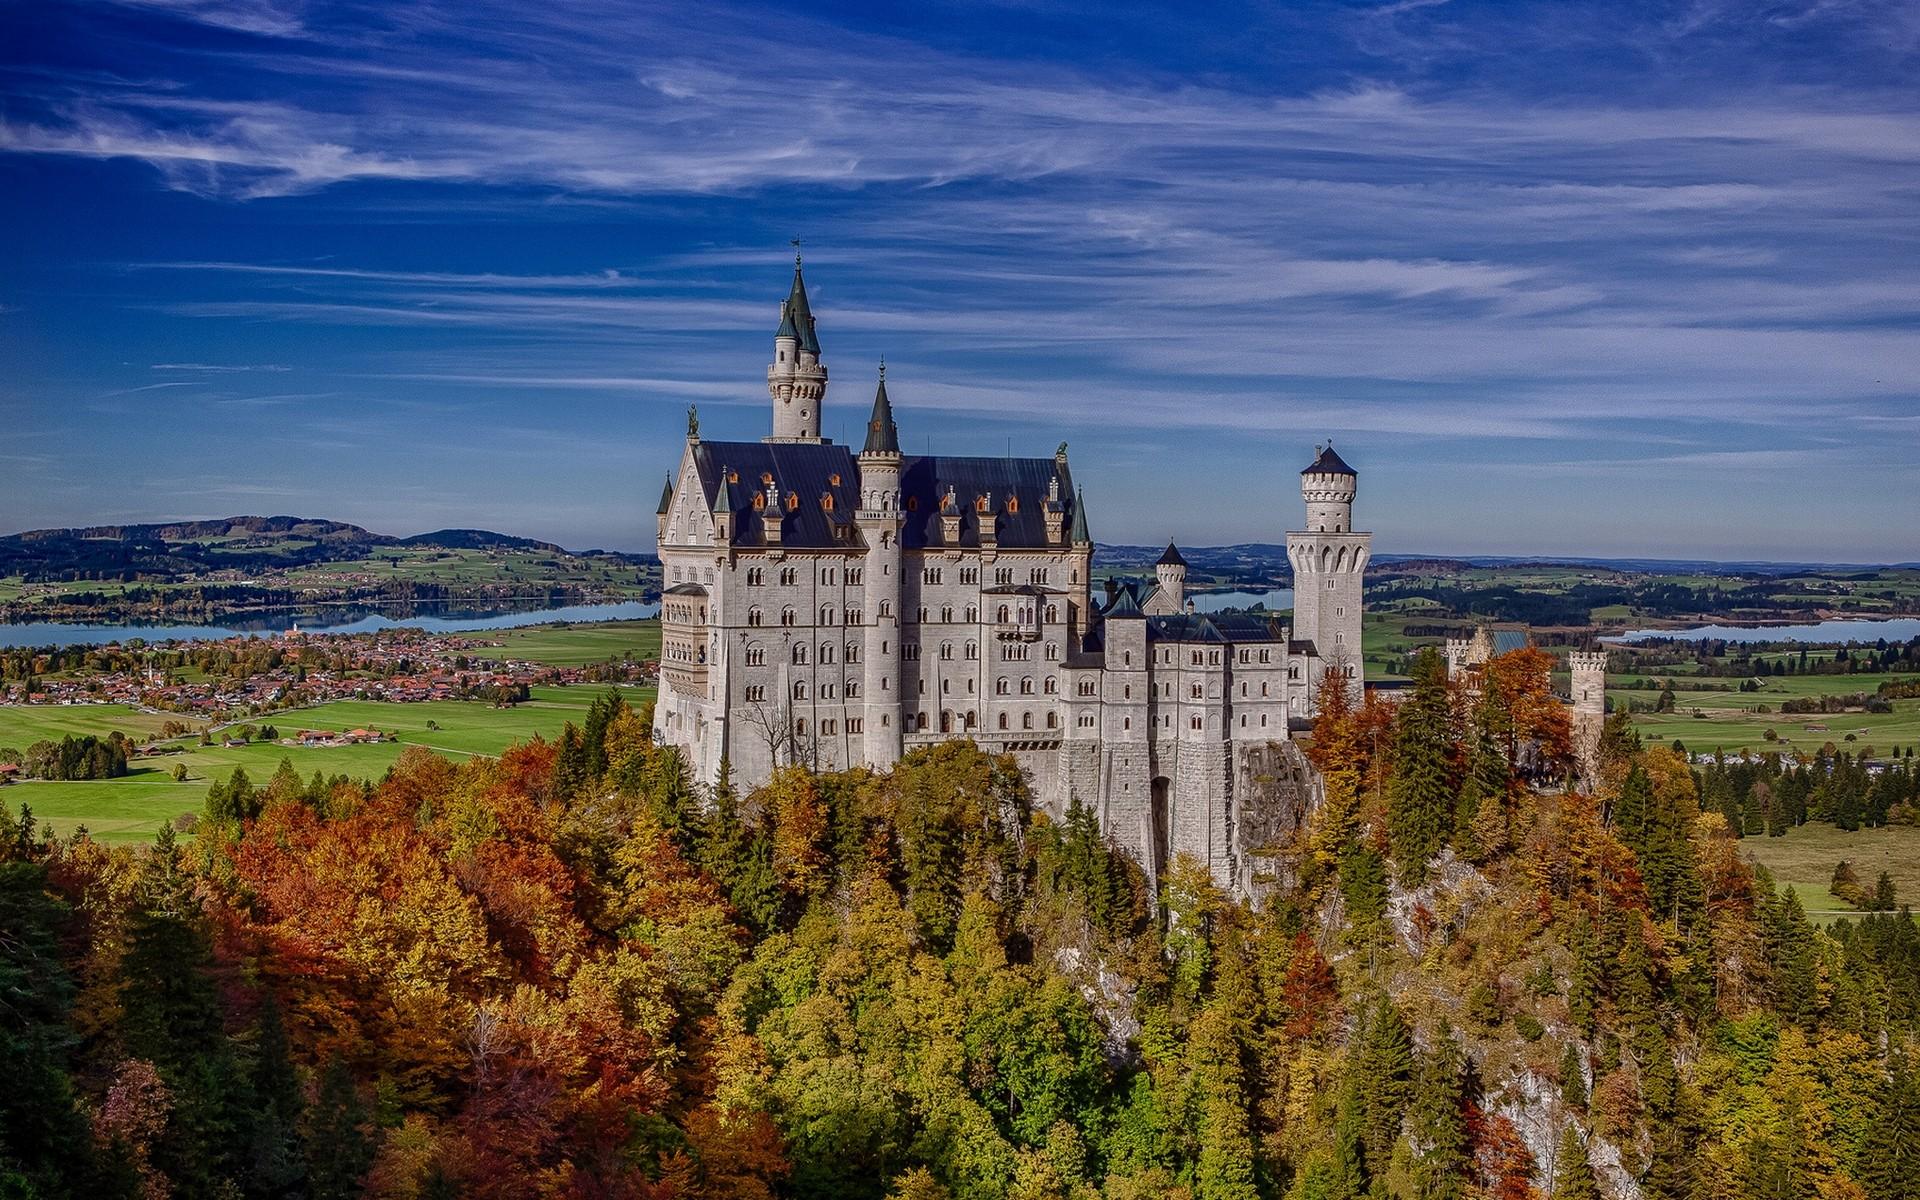 General 1920x1200 Schloss Neuschwanstein castle landscape fall village